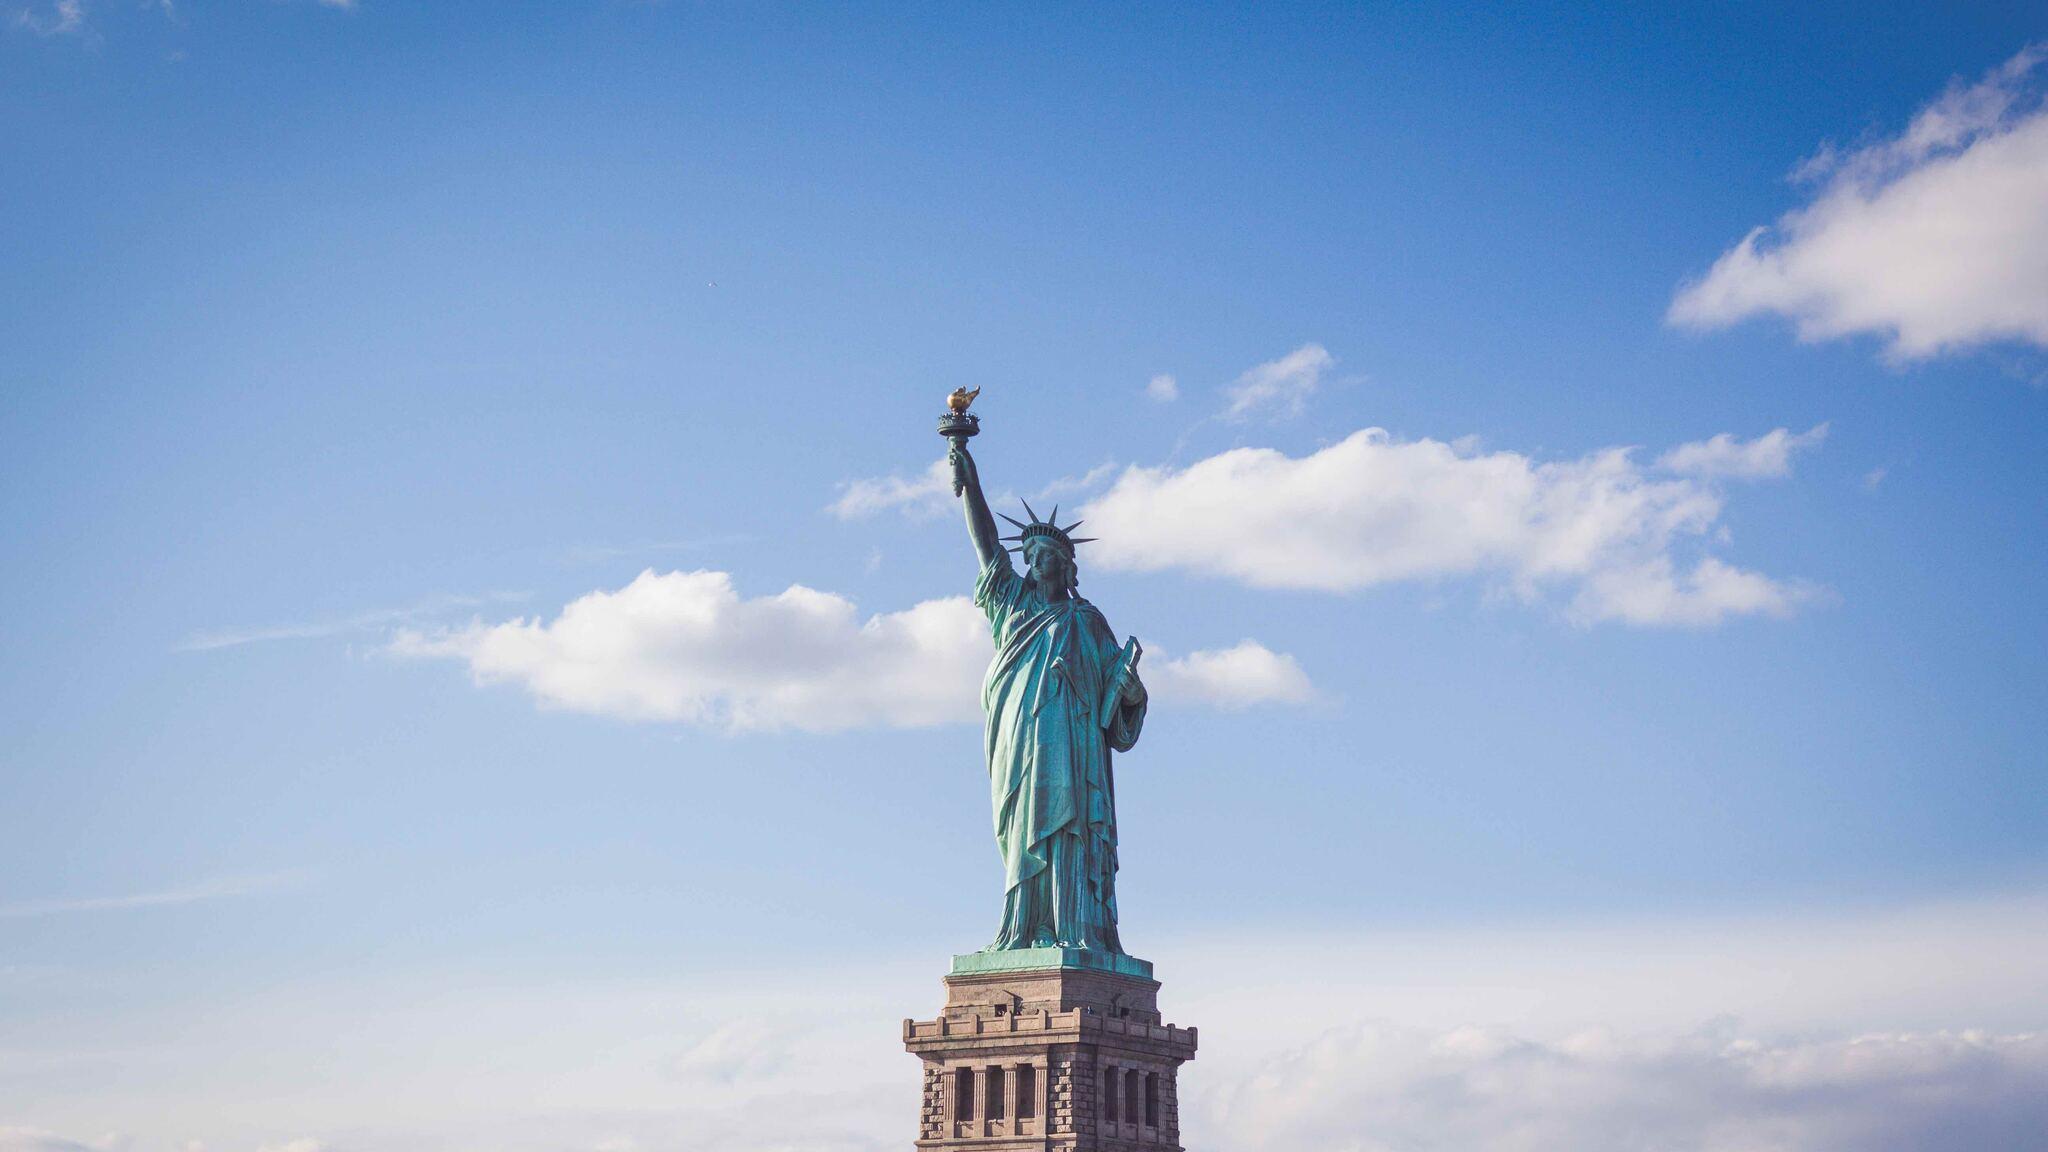 statue-of-liberty-t6.jpg